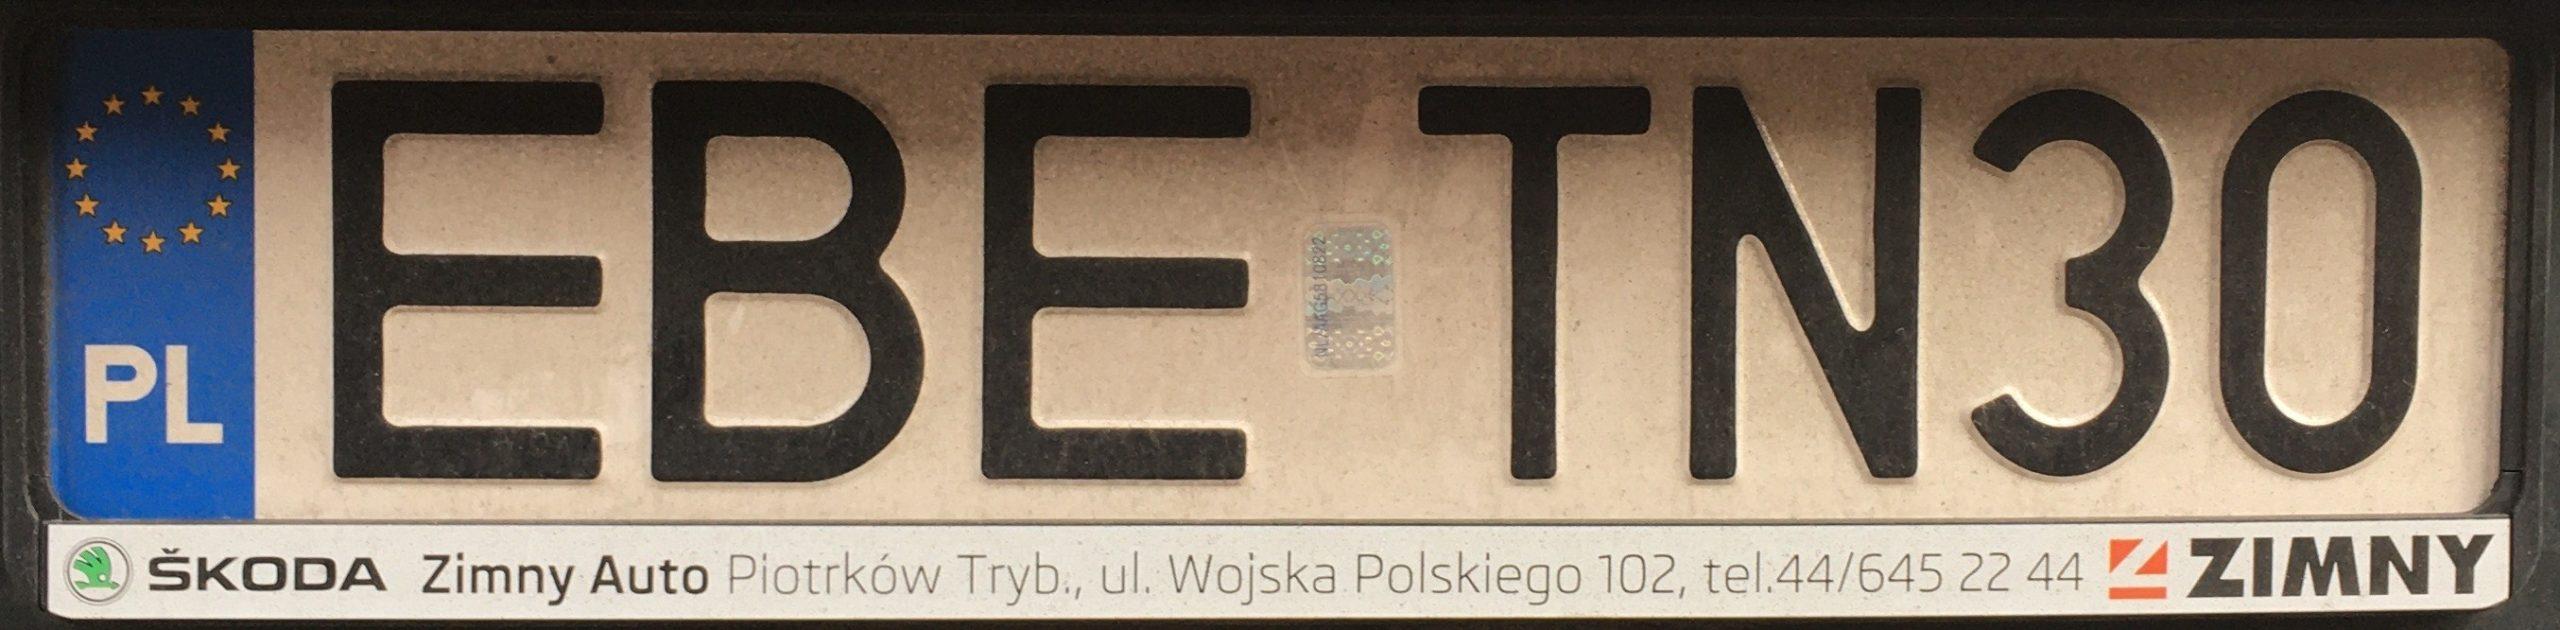 Registrační značka Polsko - EBE - Bełchatów, foto: www.podalnici.cz